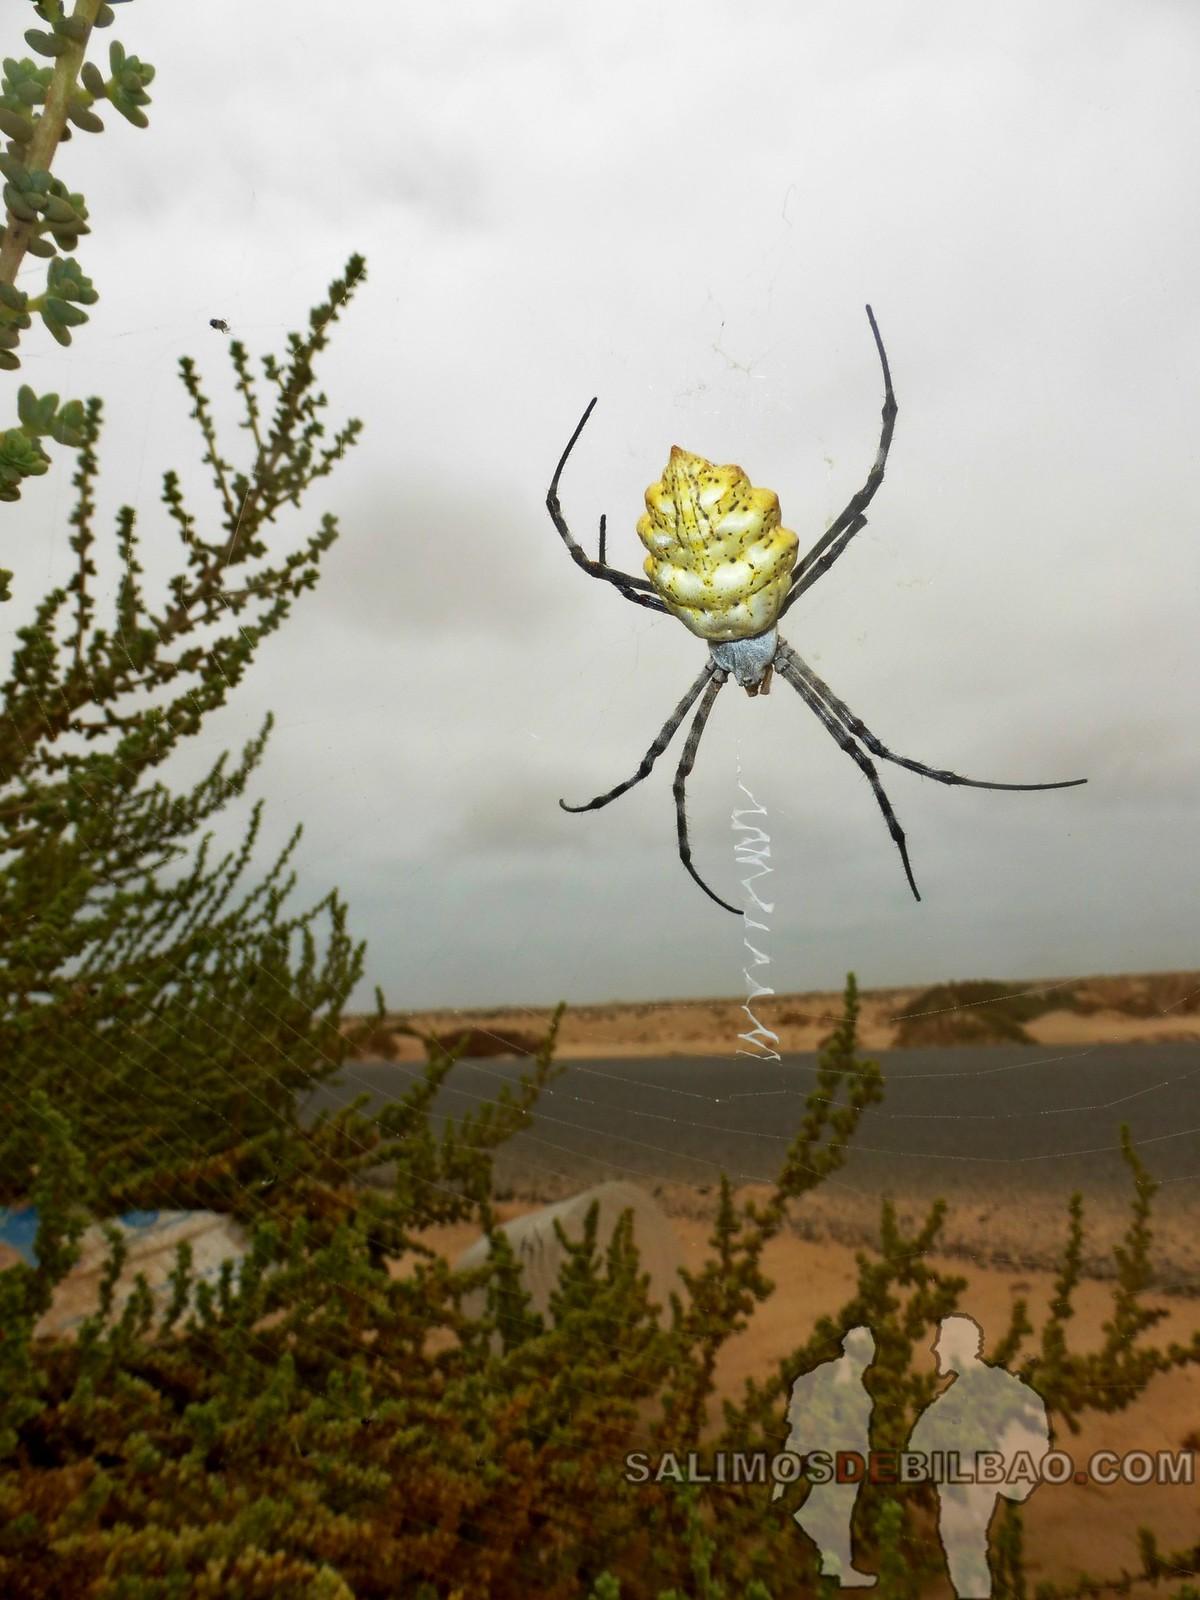 168. Araña, Paseo del Faro a la playa, Dakhla